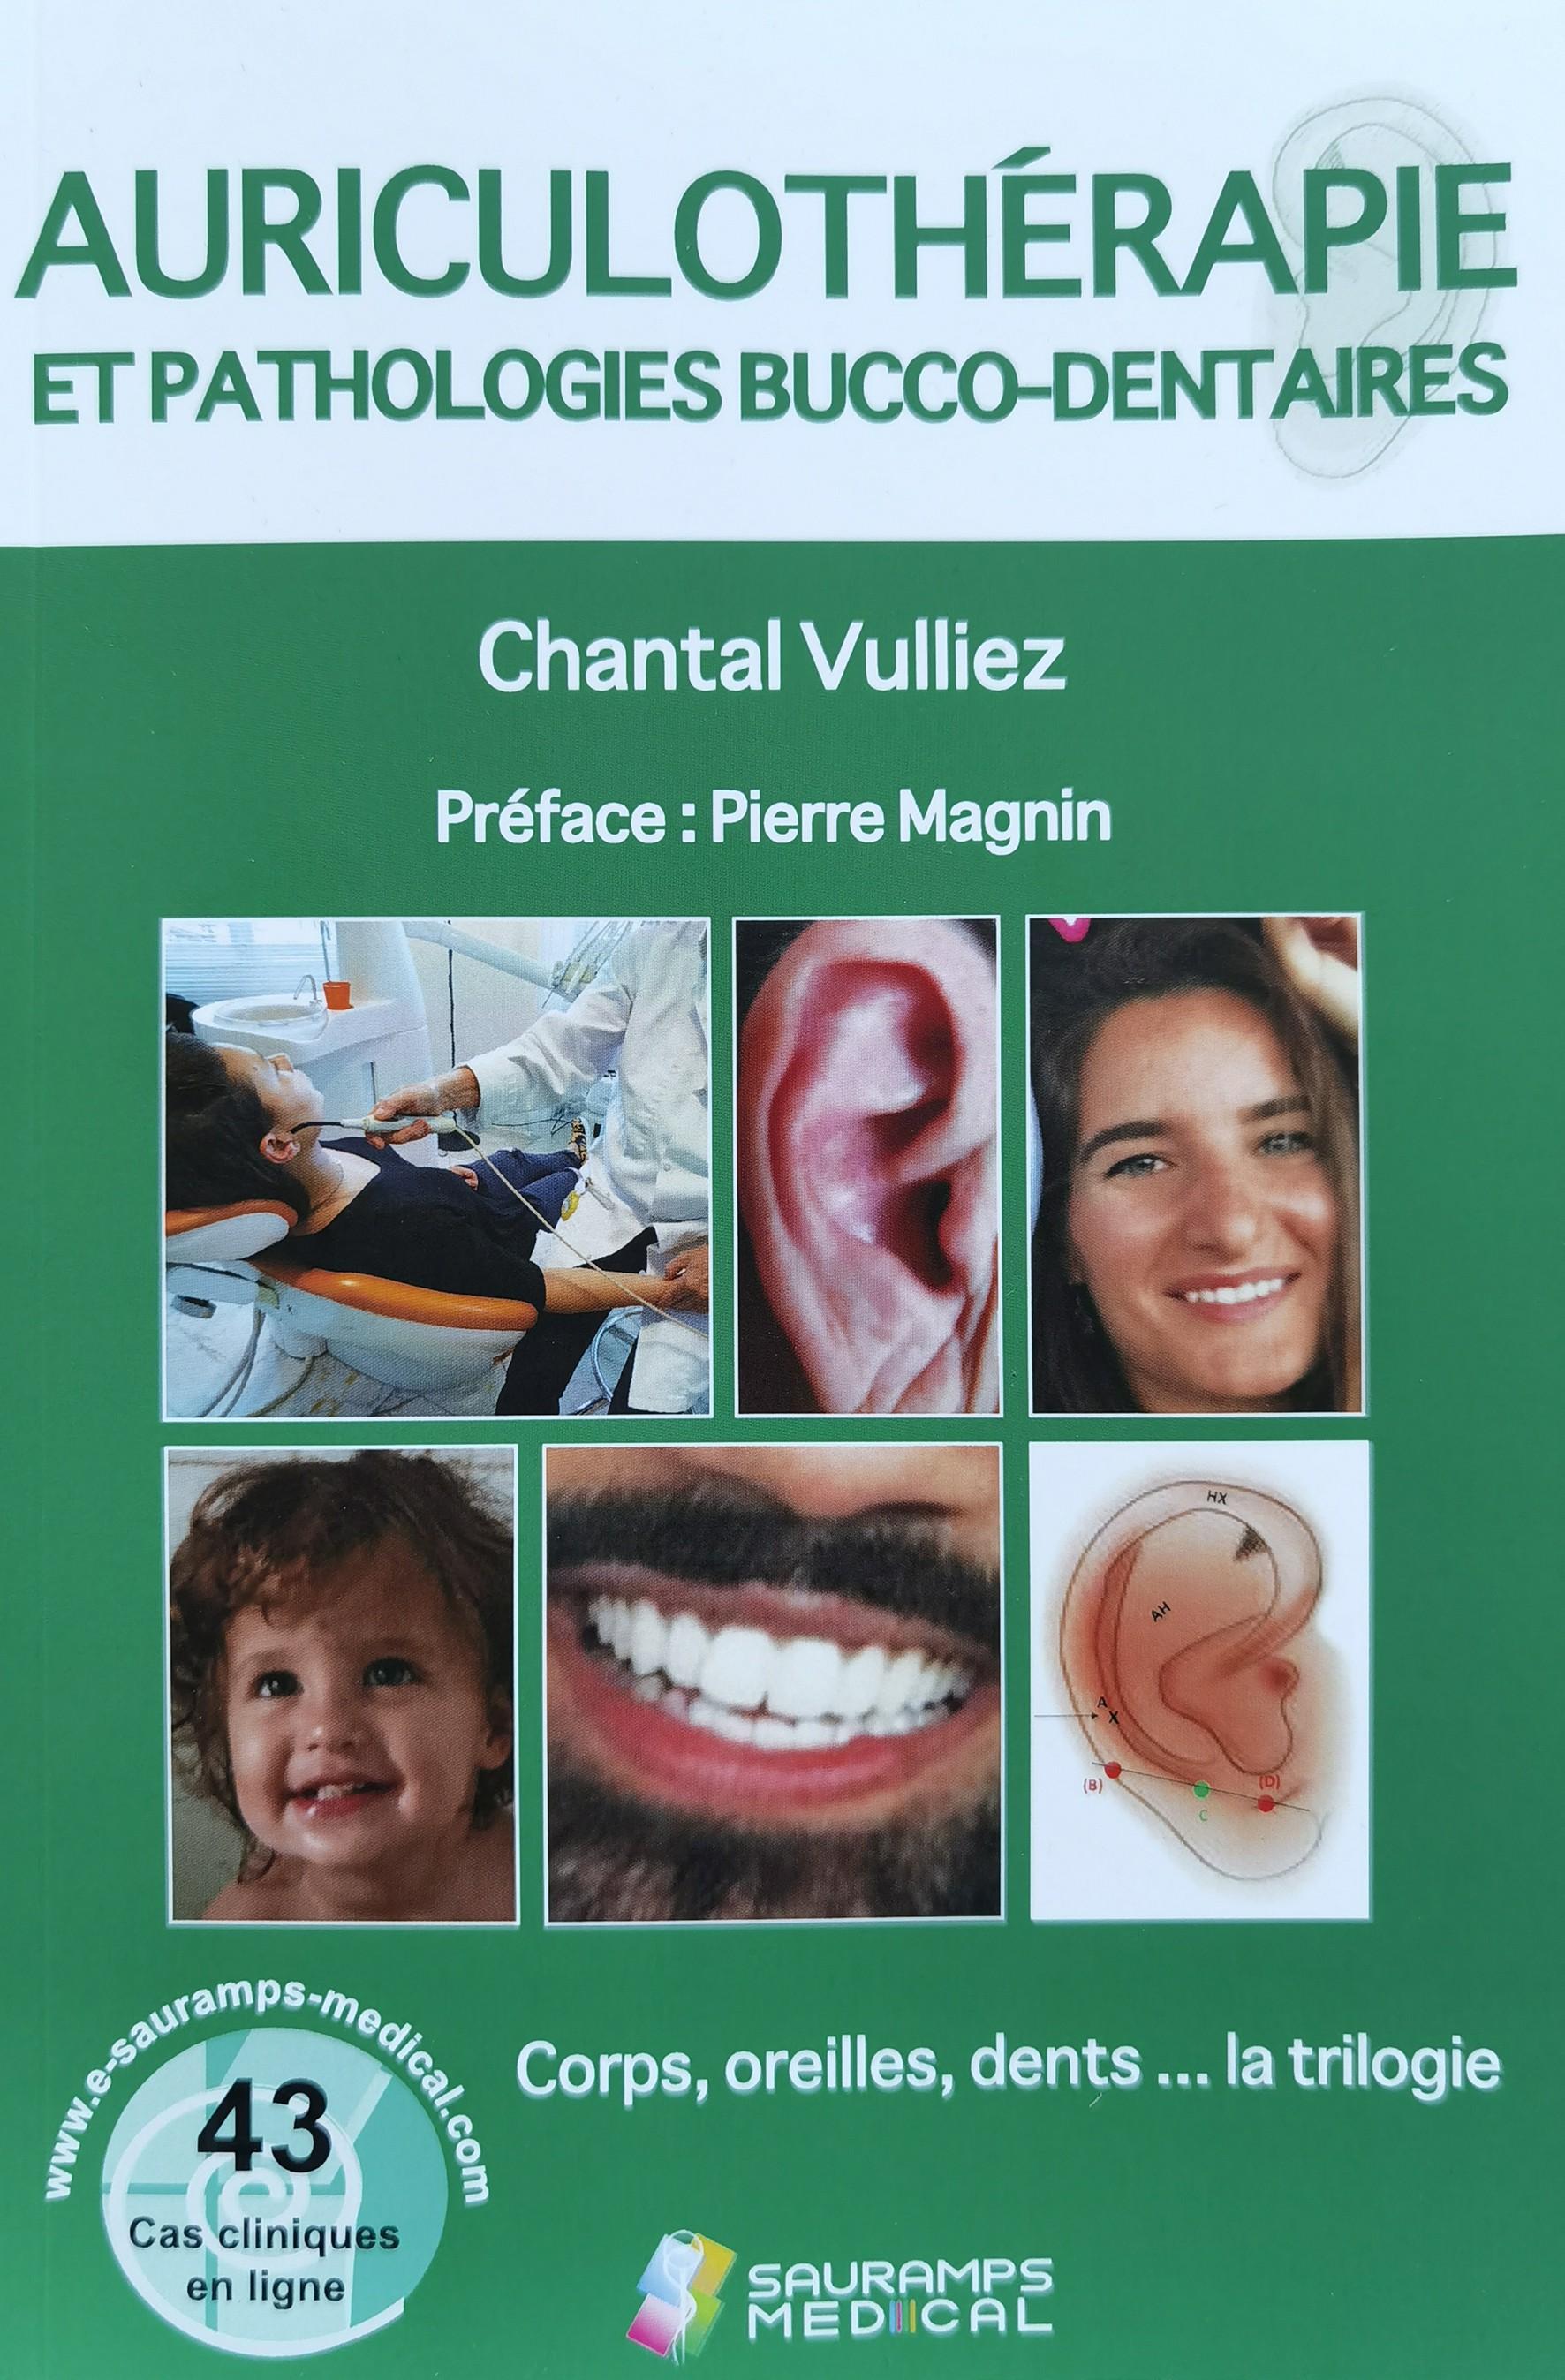 C. VULLIEZ - Auriculothérapie et pathologies bucco-dentaires - Editeur Sauramps medical-LICVUL02-FR